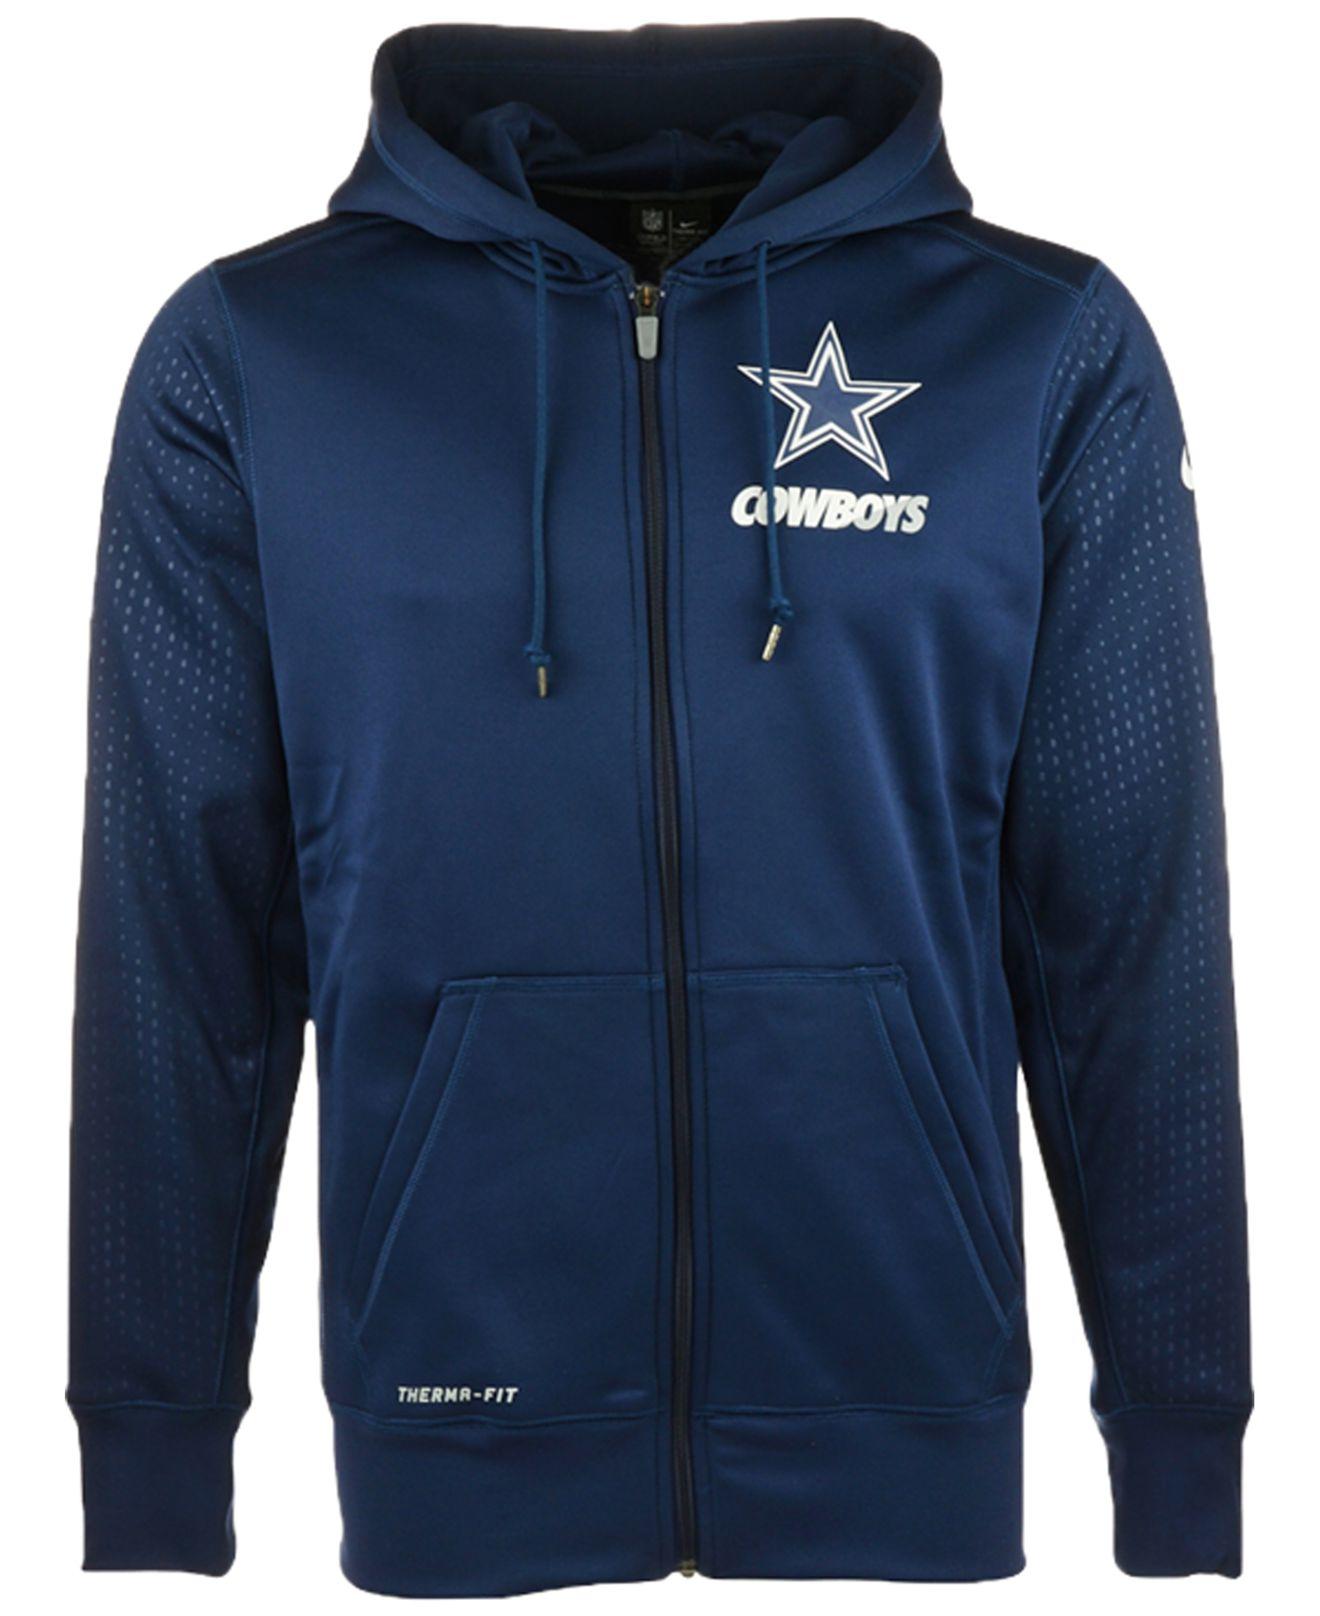 reputable site 91e8a b5744 mens dallas cowboys zip up hoodie